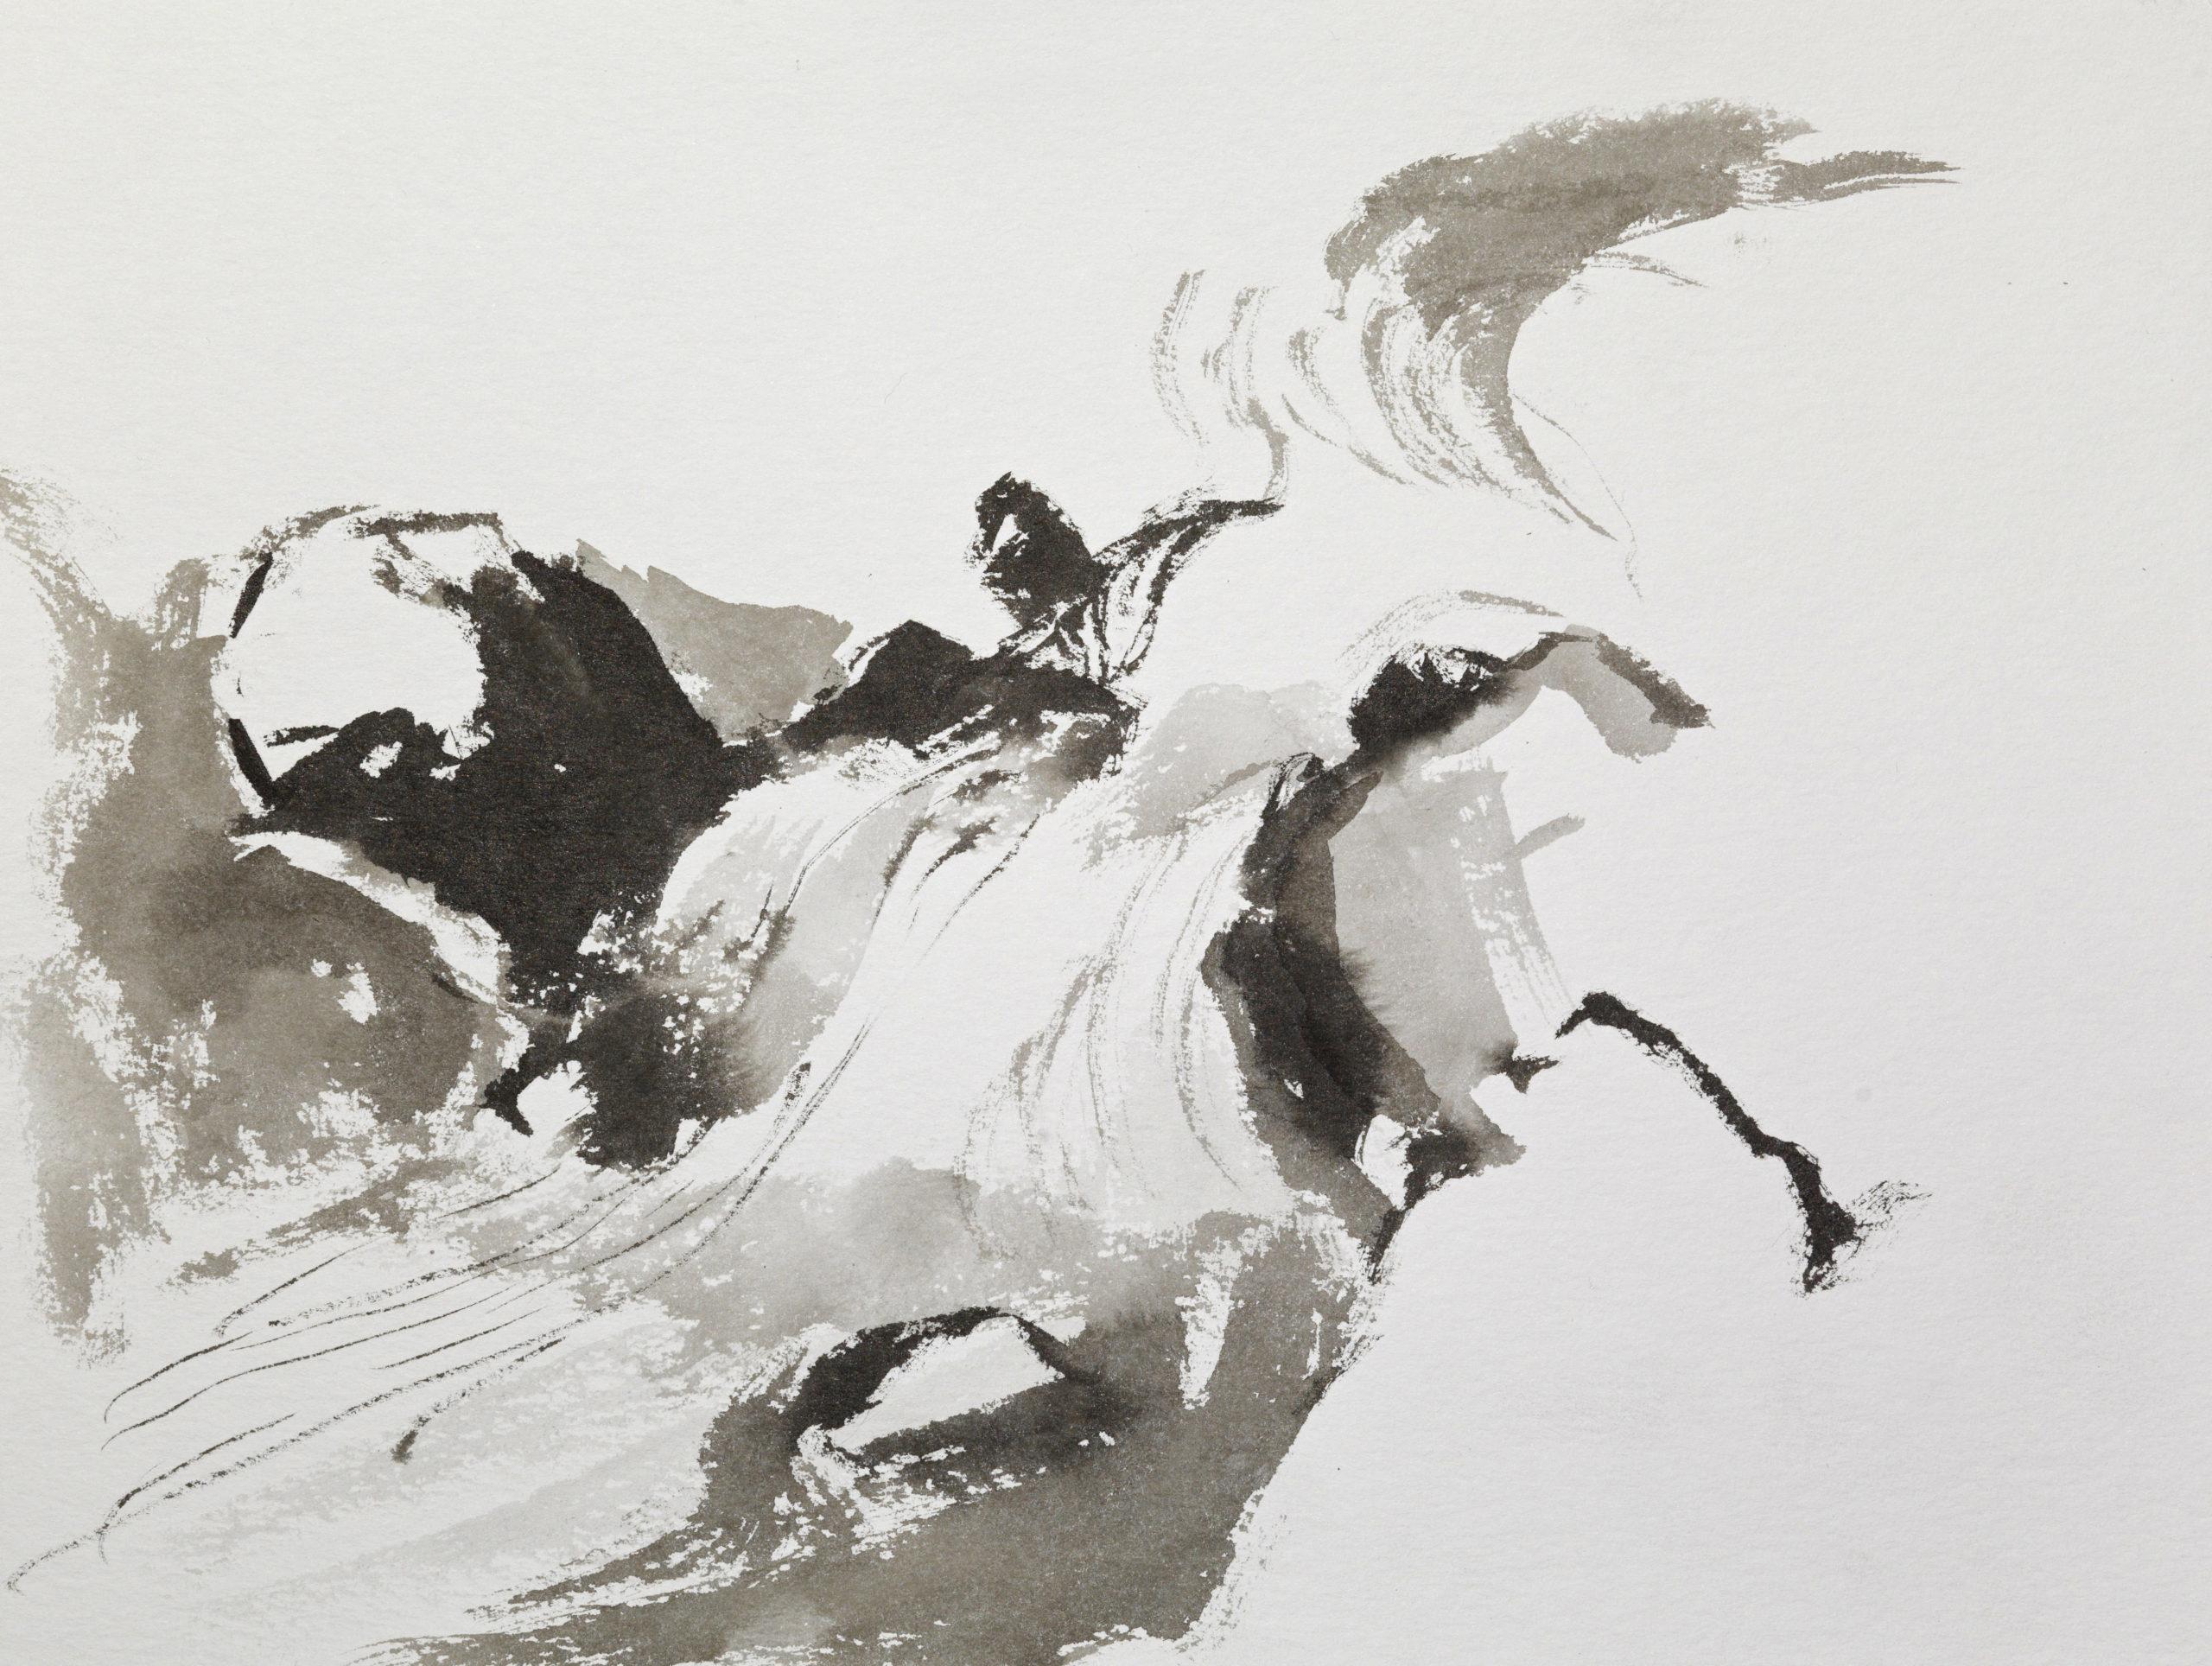 Stream, 32x24cm, ink, paper, 2018